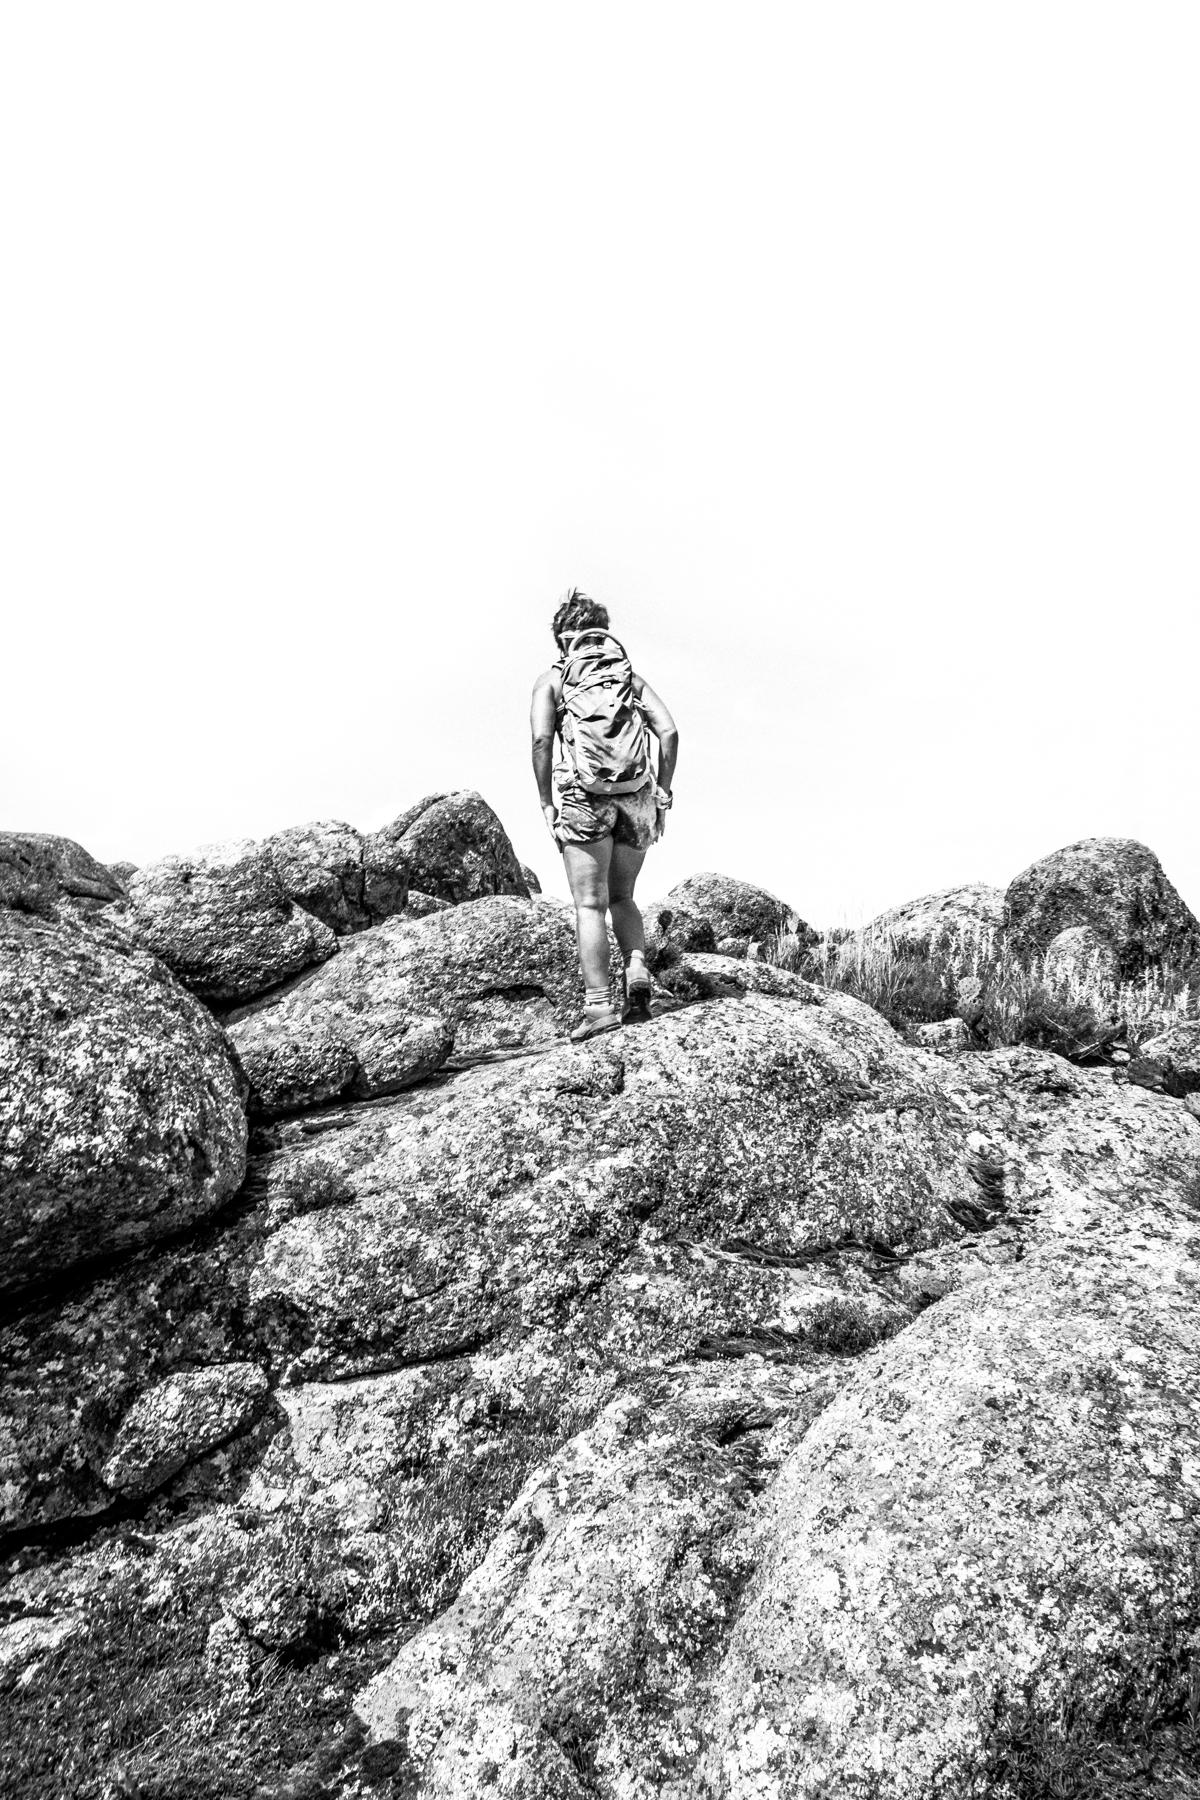 2017-06-25 Mount Lincoln B (8 of 20).jpg